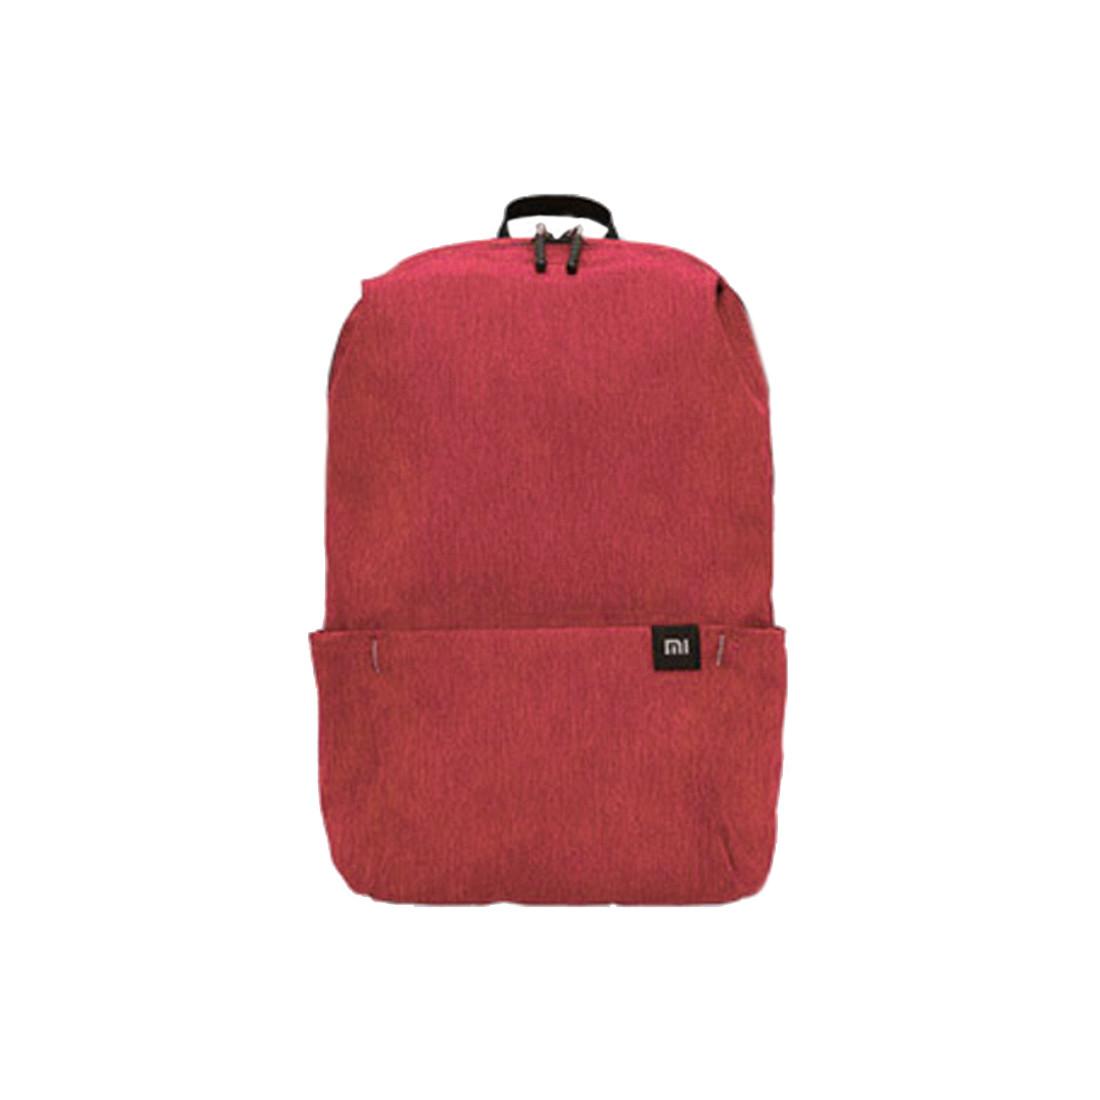 Xiaomi ZJB4137 Рюкзак RunMi 90 Points Eight Colors, 10 л, 34х22.5х13 см, Полиэфирное волокно, Красный